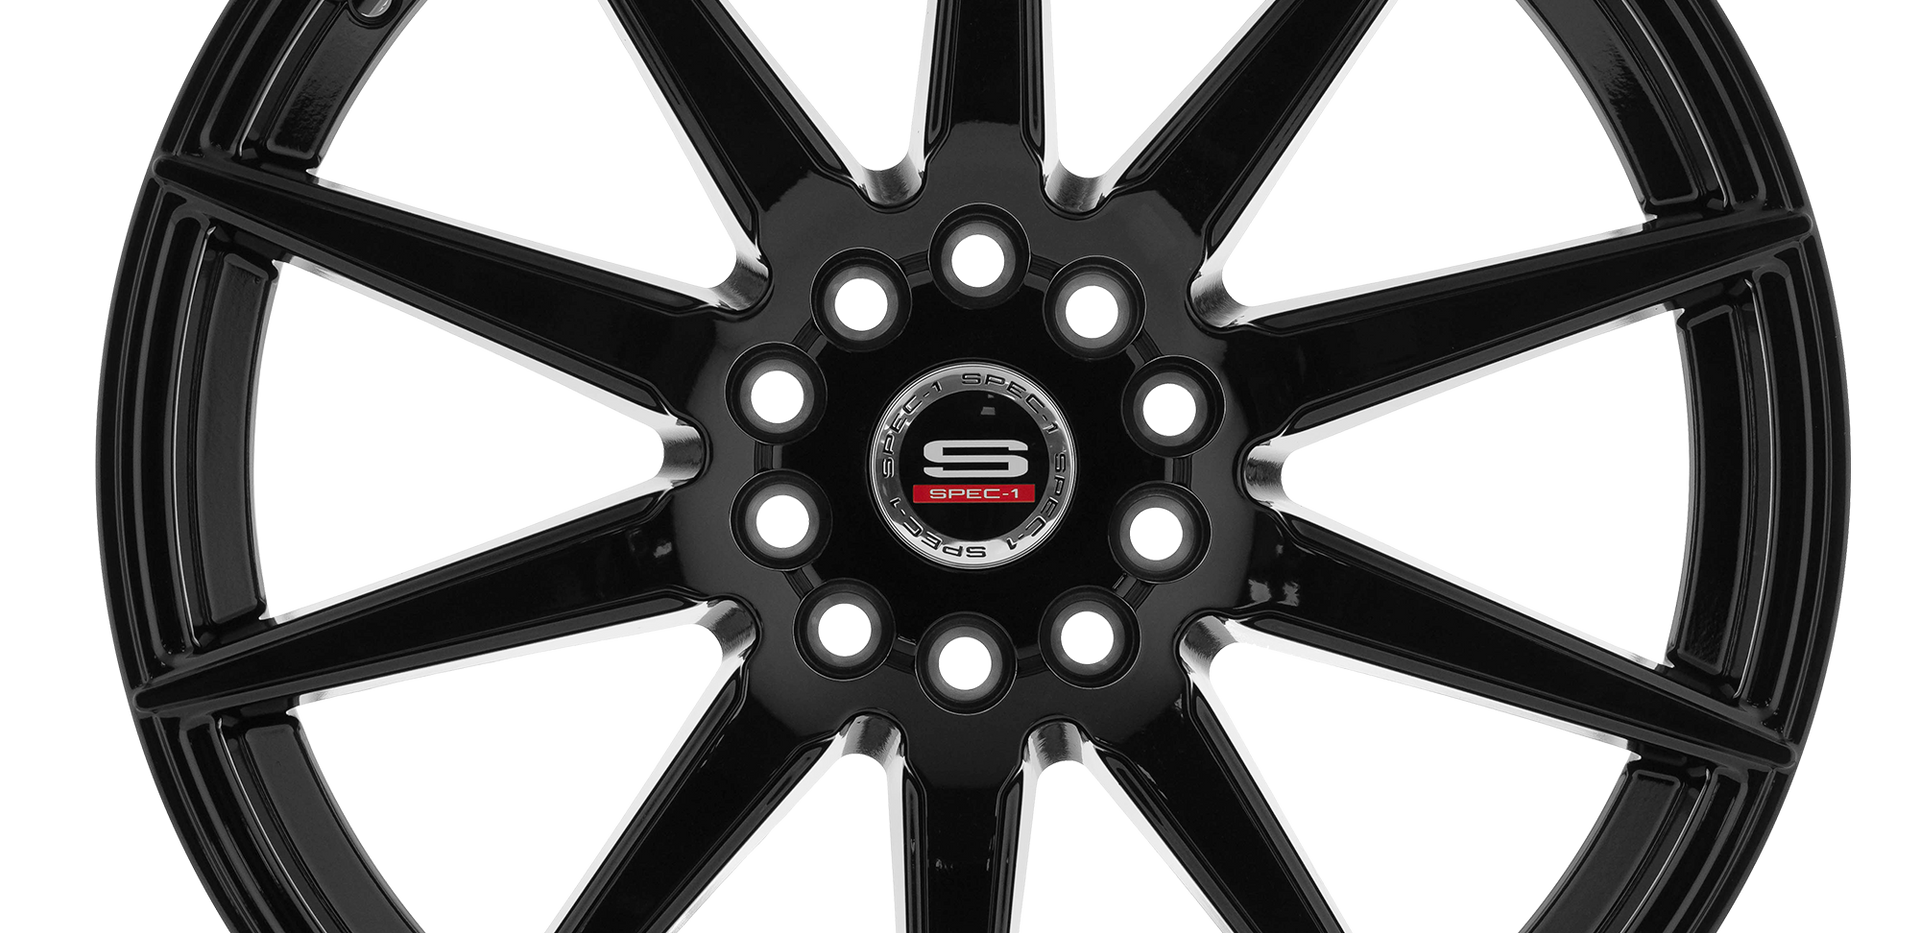 SP-51